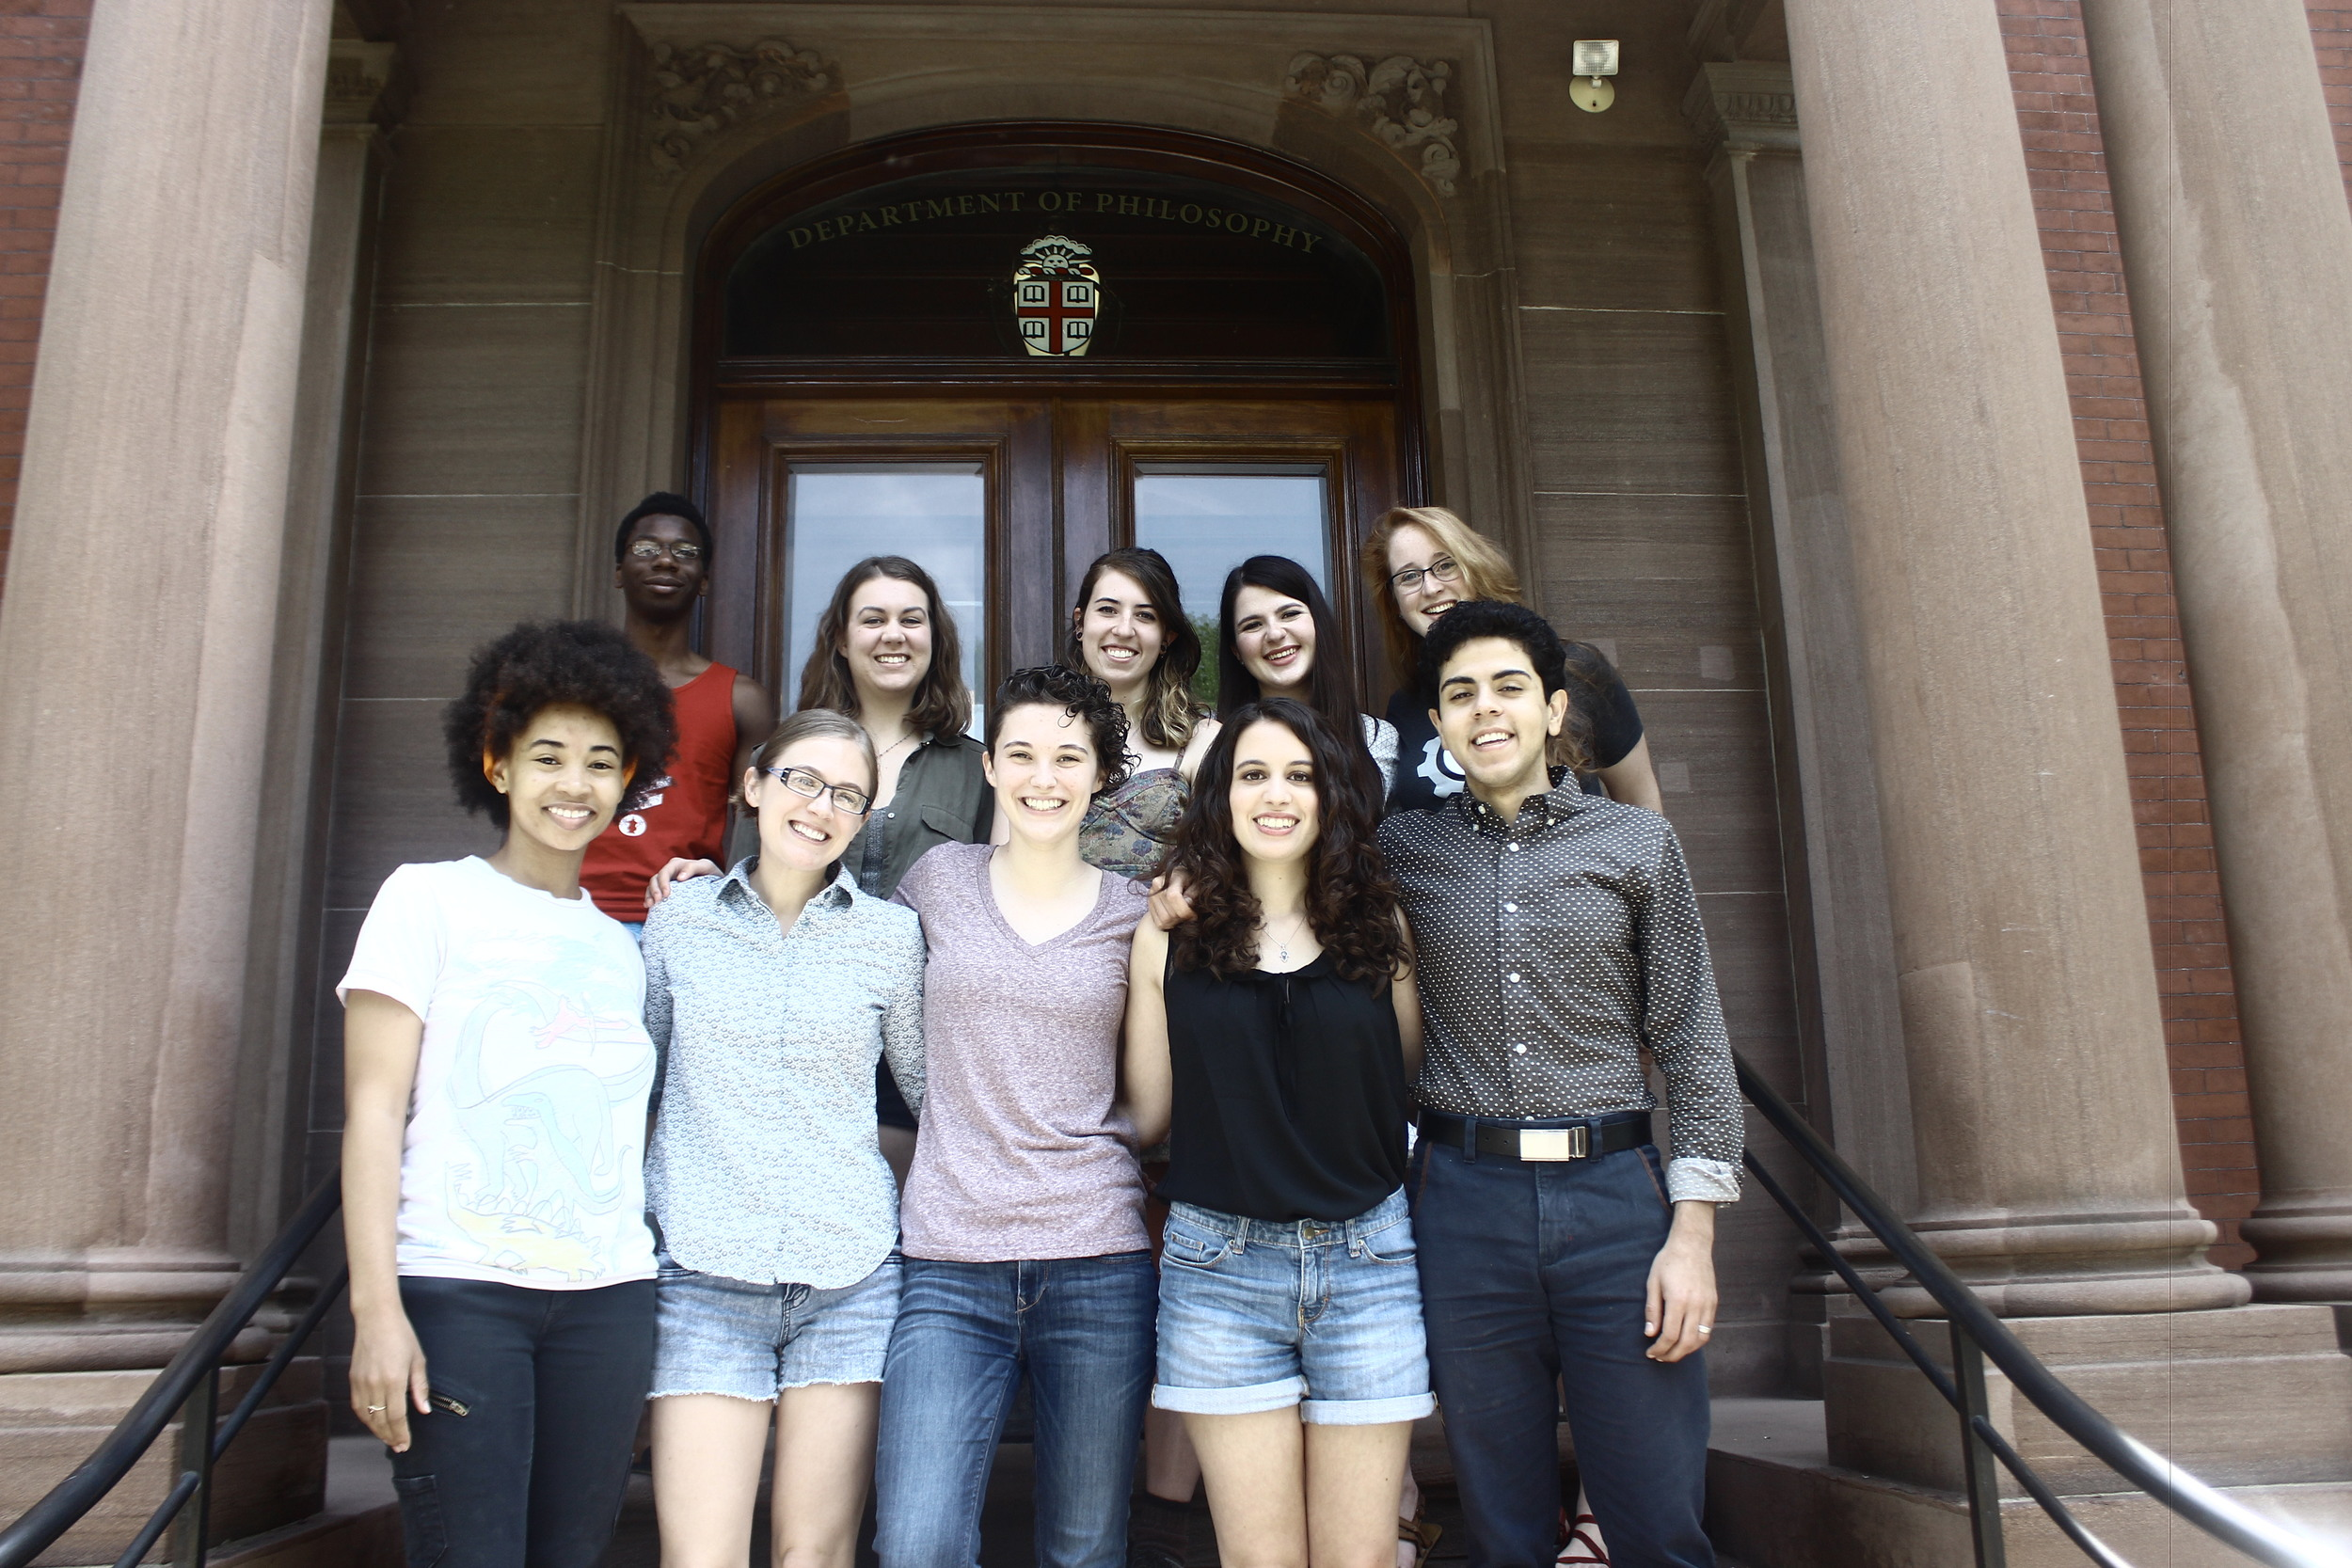 Top row, left to right: Darian Bolen, Madeline Aruffo, Katie Owens, Sam Gerleman, Kristen Beard. Bottom row, left to right: Mariah Levy, Kirsi Teppo, Mallory Webber, Eliana Peck, Sayid Bnefsi.